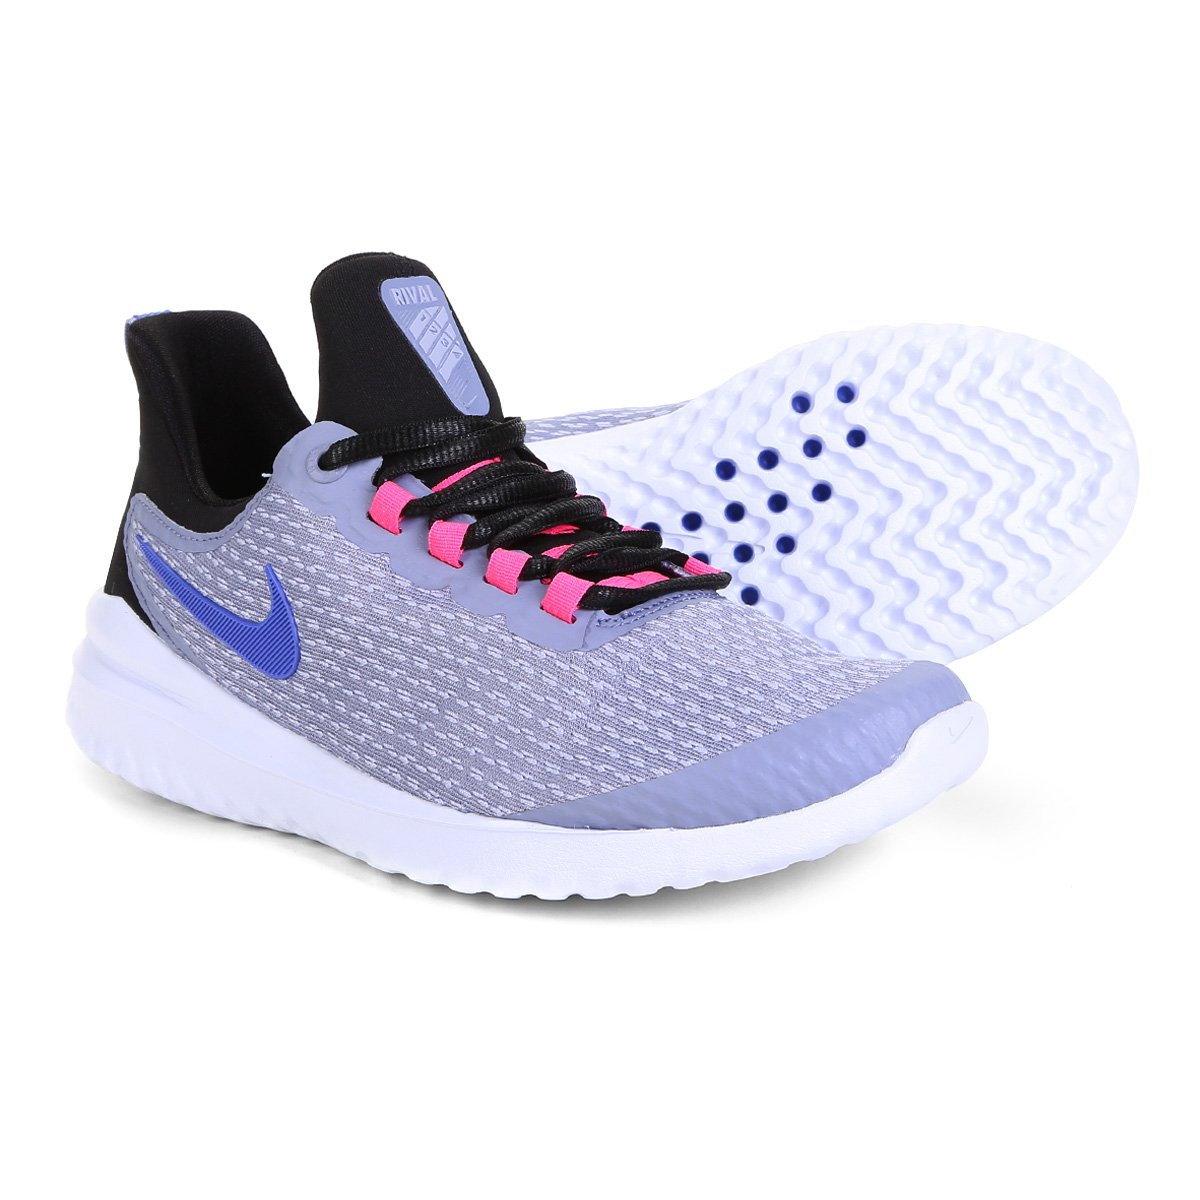 2be35dc2e393e Tênis Nike Renew Rival Feminino - Lilás - Compre Agora   Netshoes